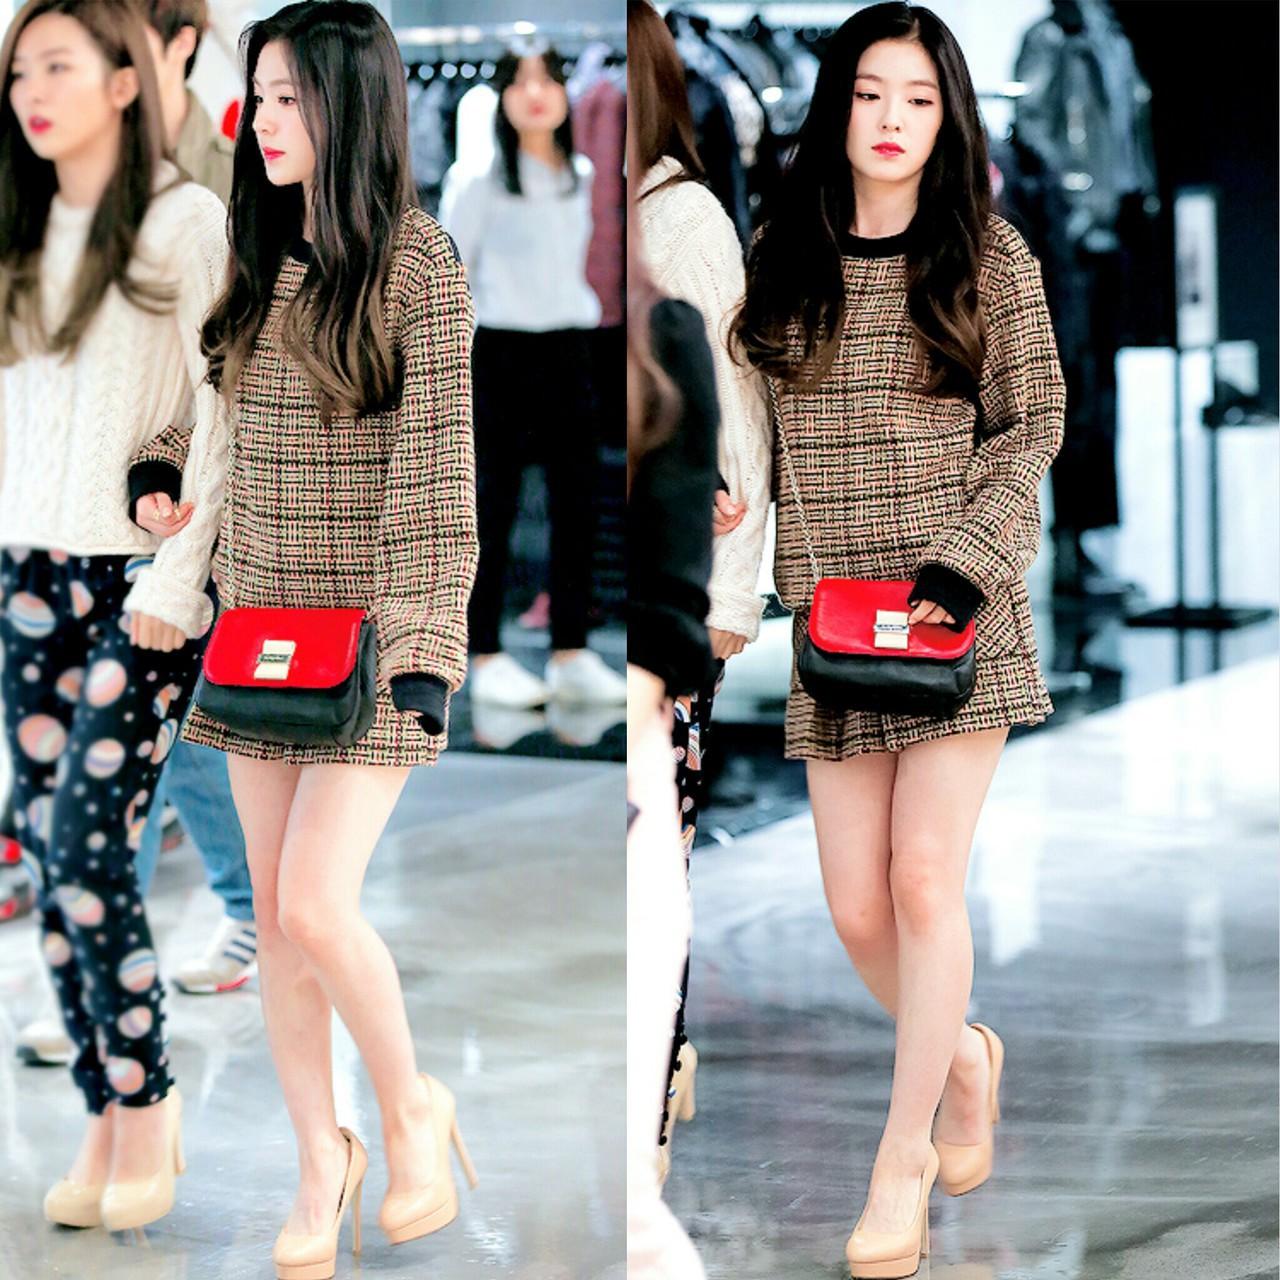 Irene S Cute Fashion Style On We Heart It